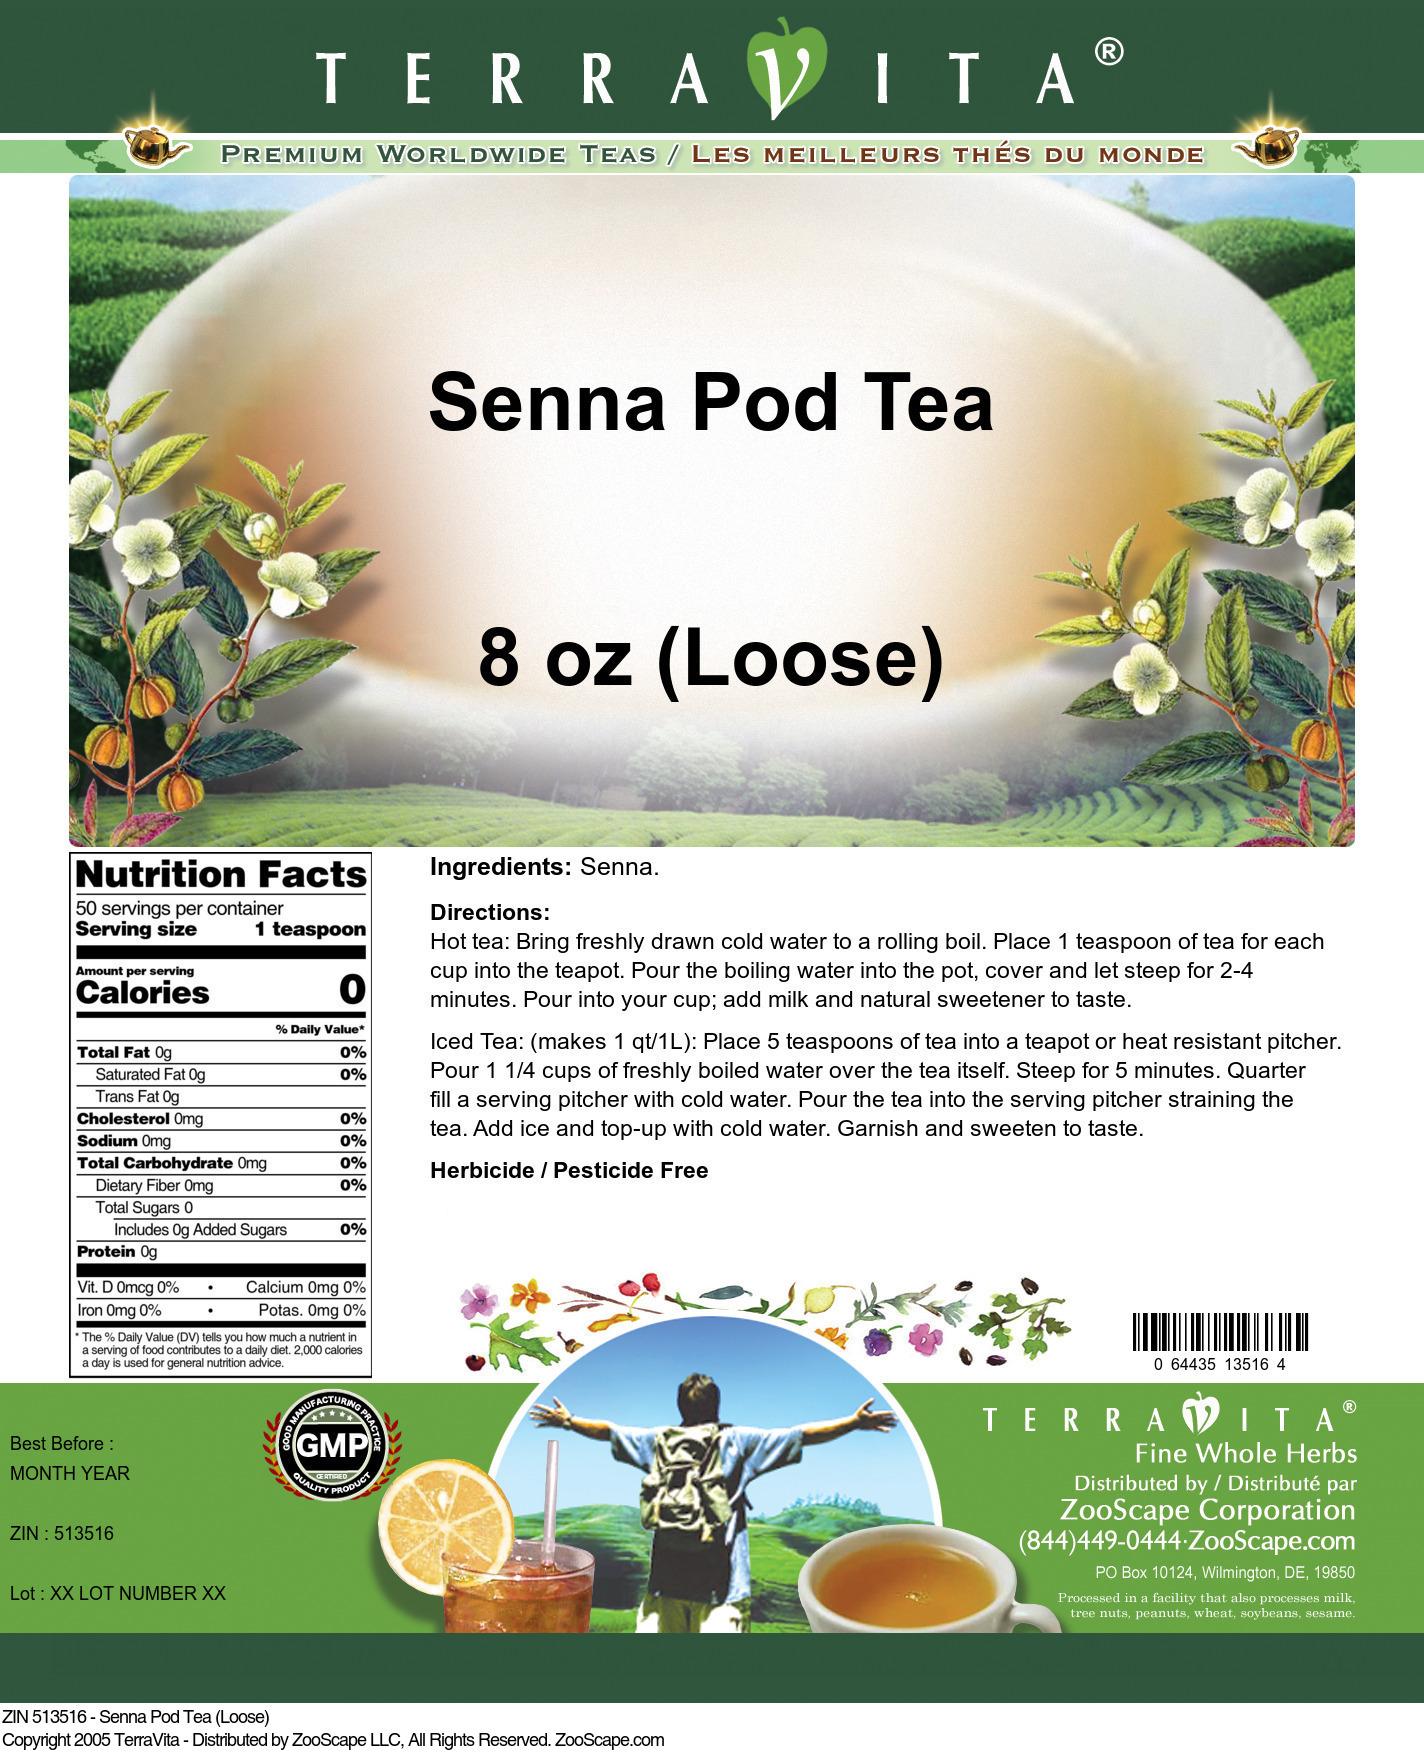 Senna Pod Tea (Loose)